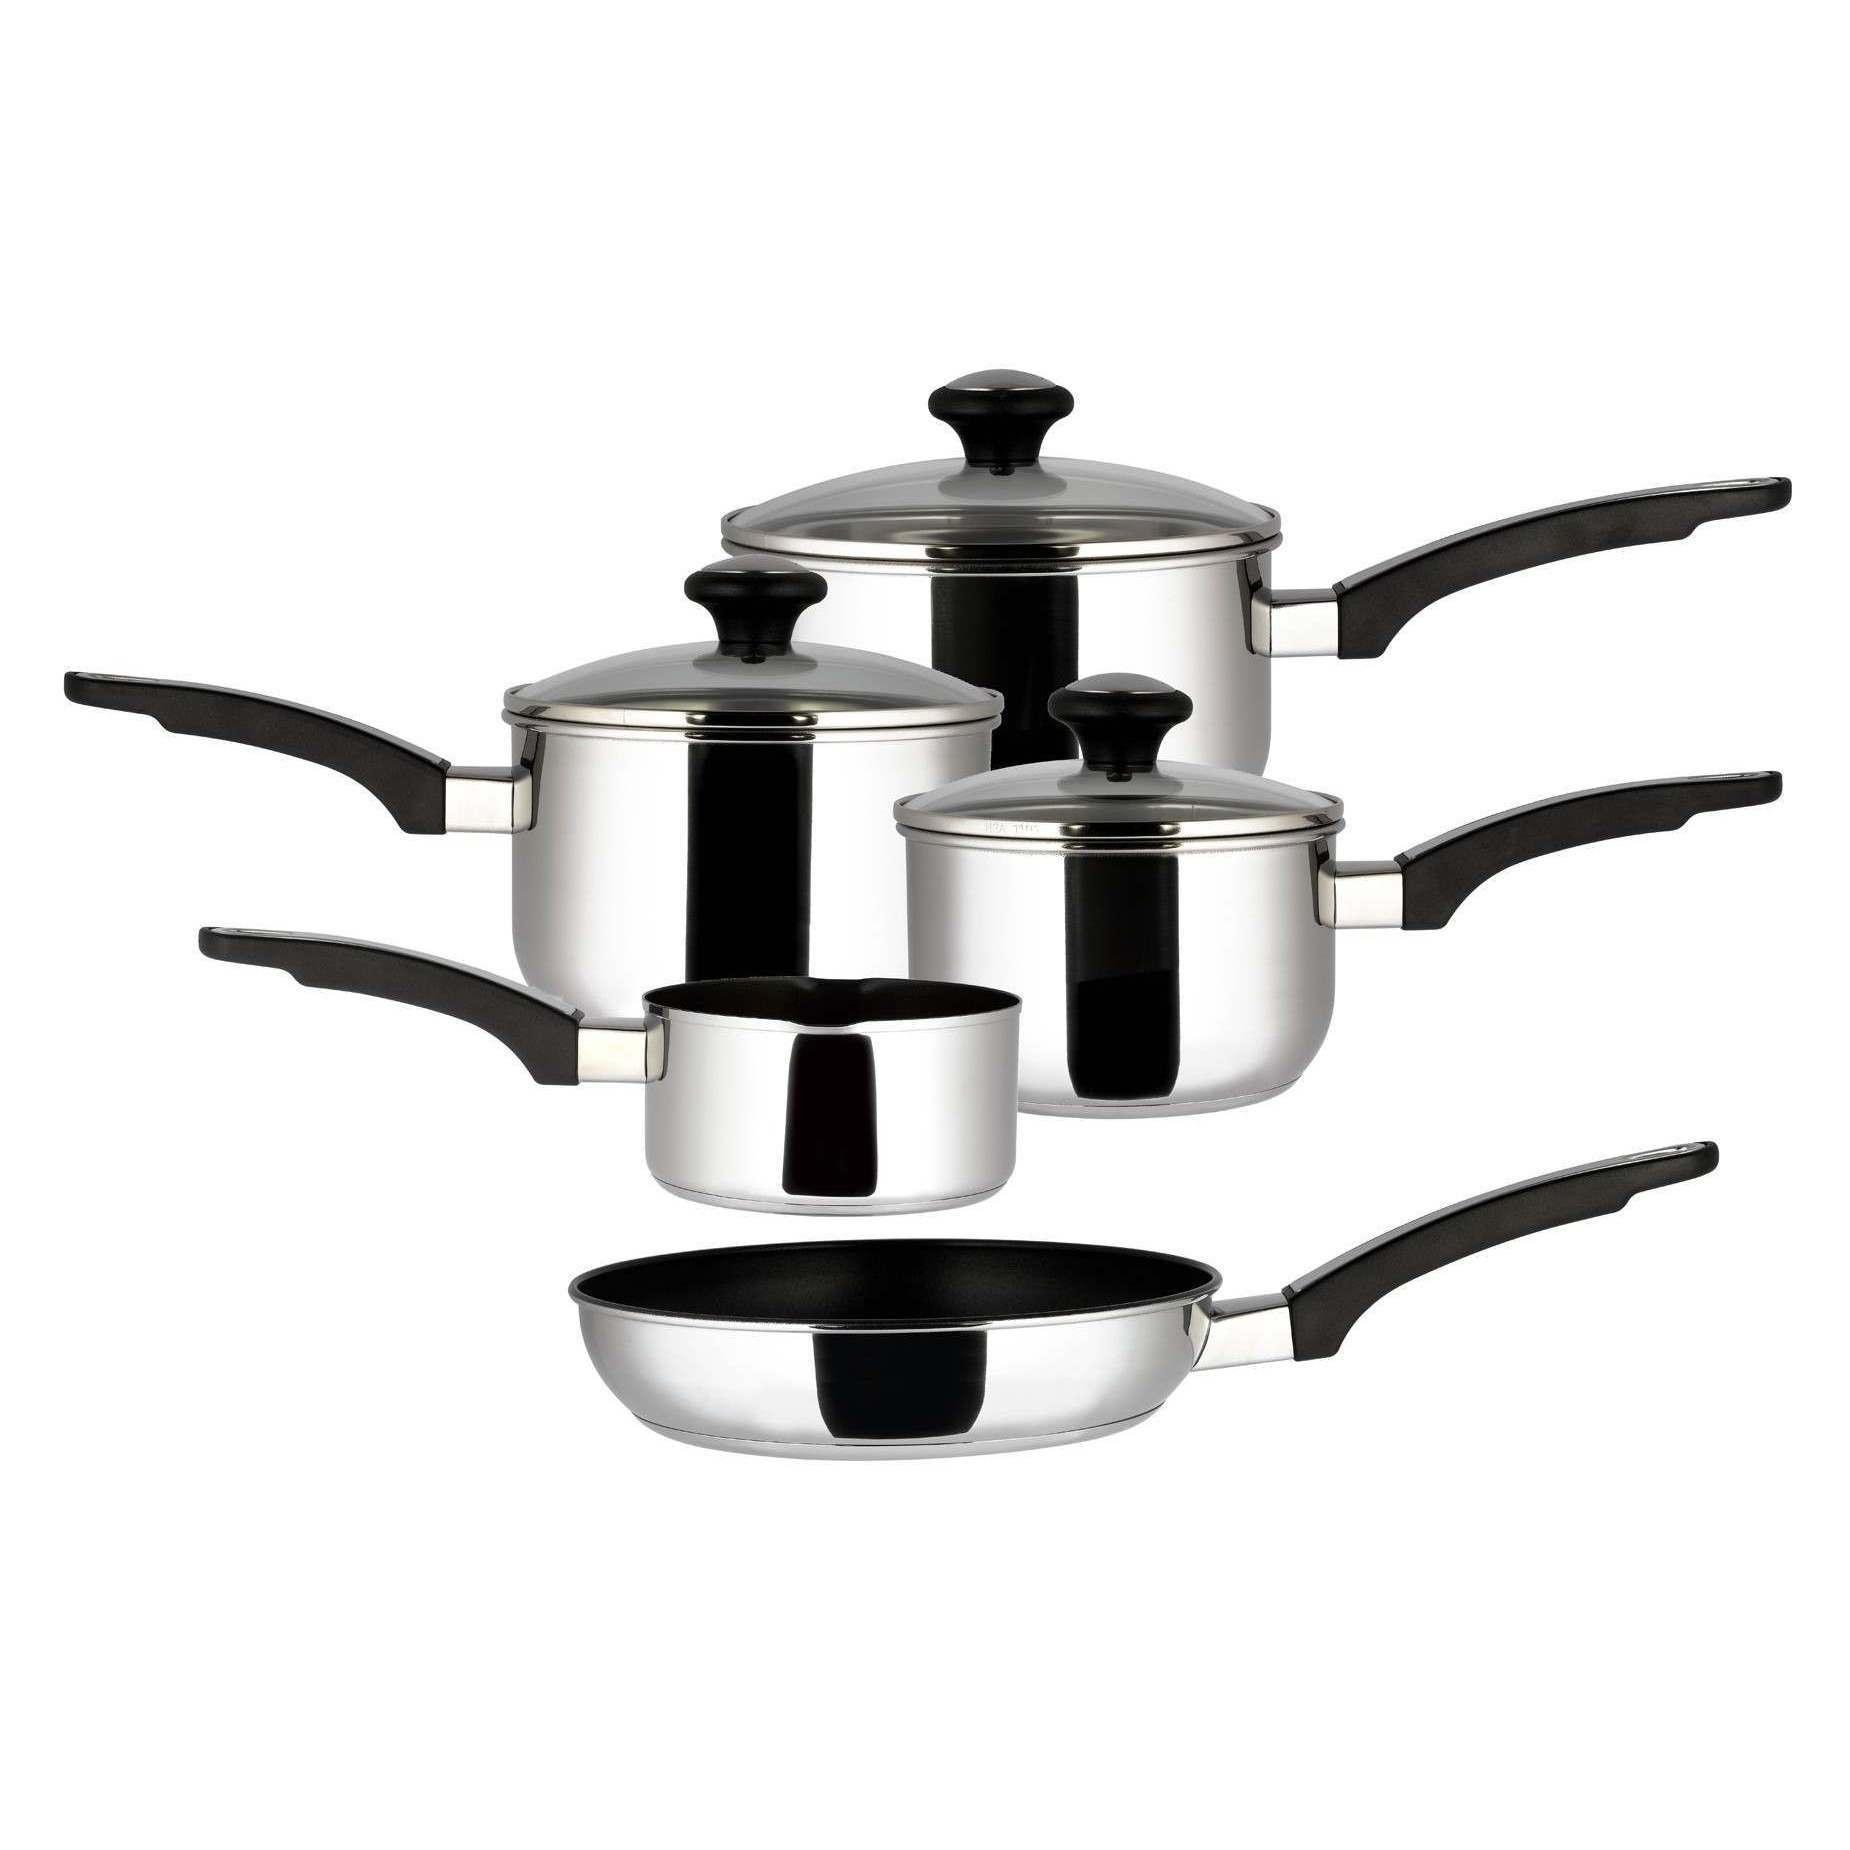 Prestige Everyday Stainless Steel Pan Set excellent reviews £53.09 @ Prestige